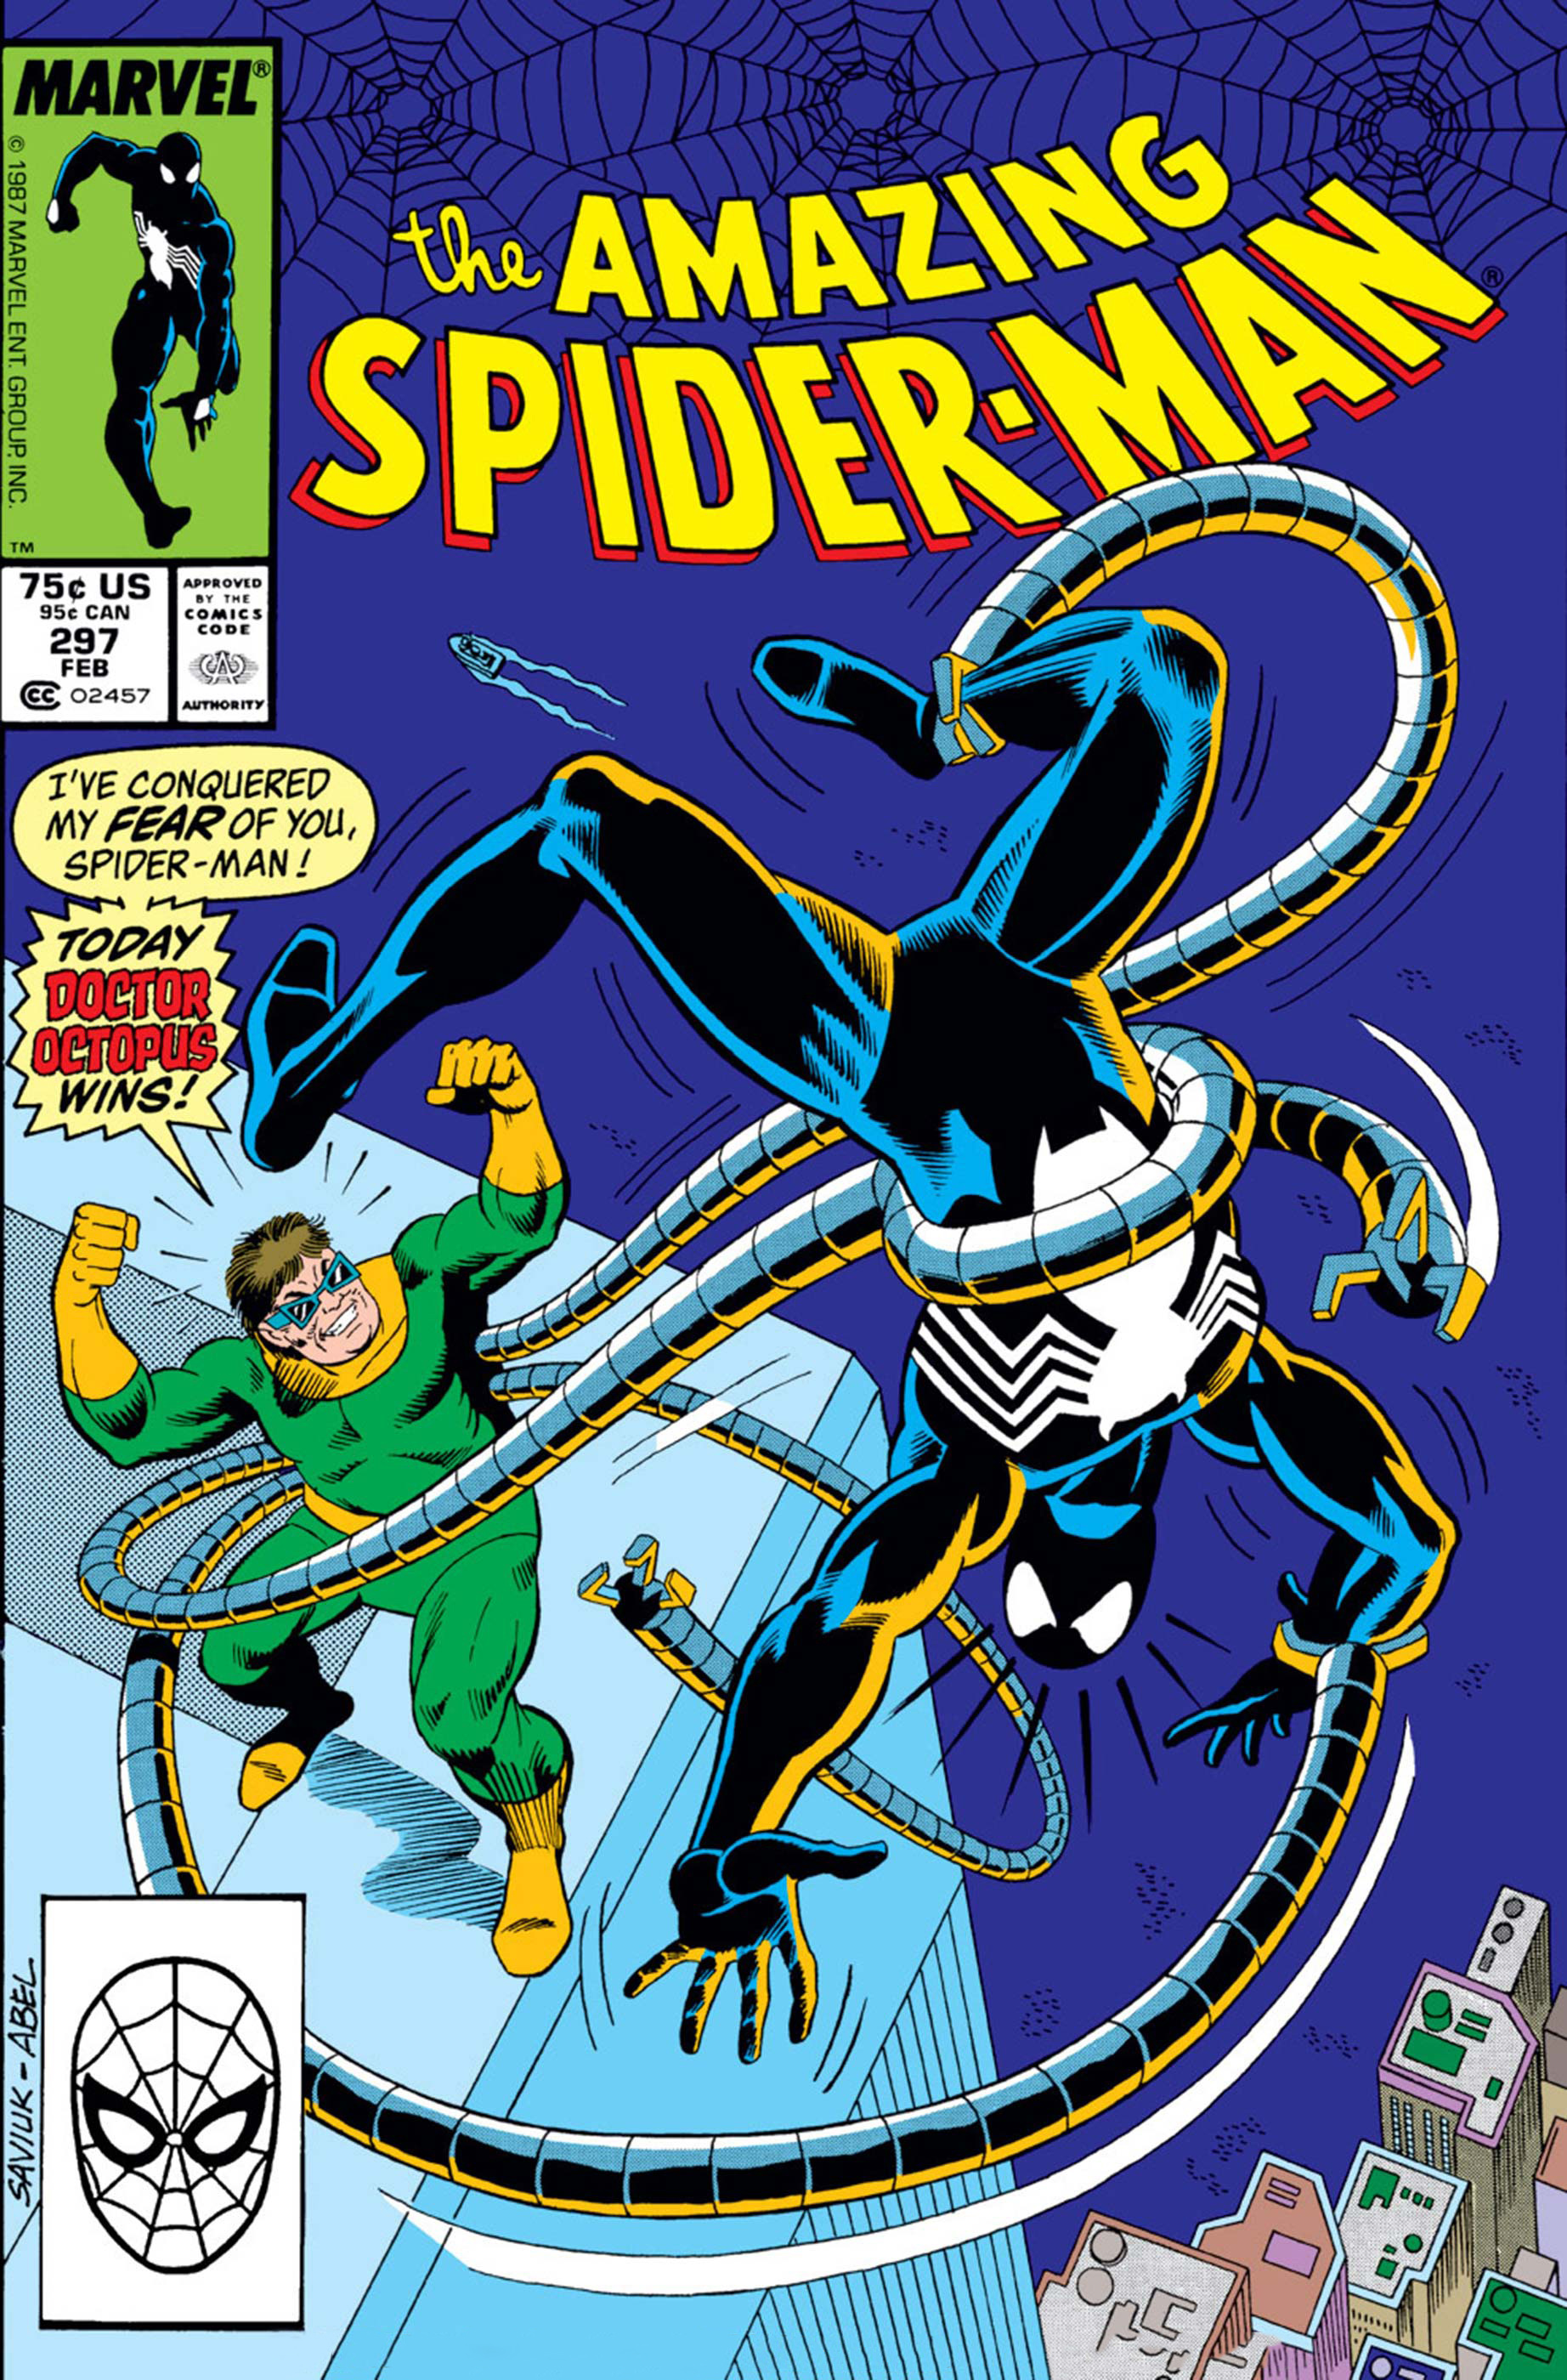 The Amazing Spider-Man (1963) #297